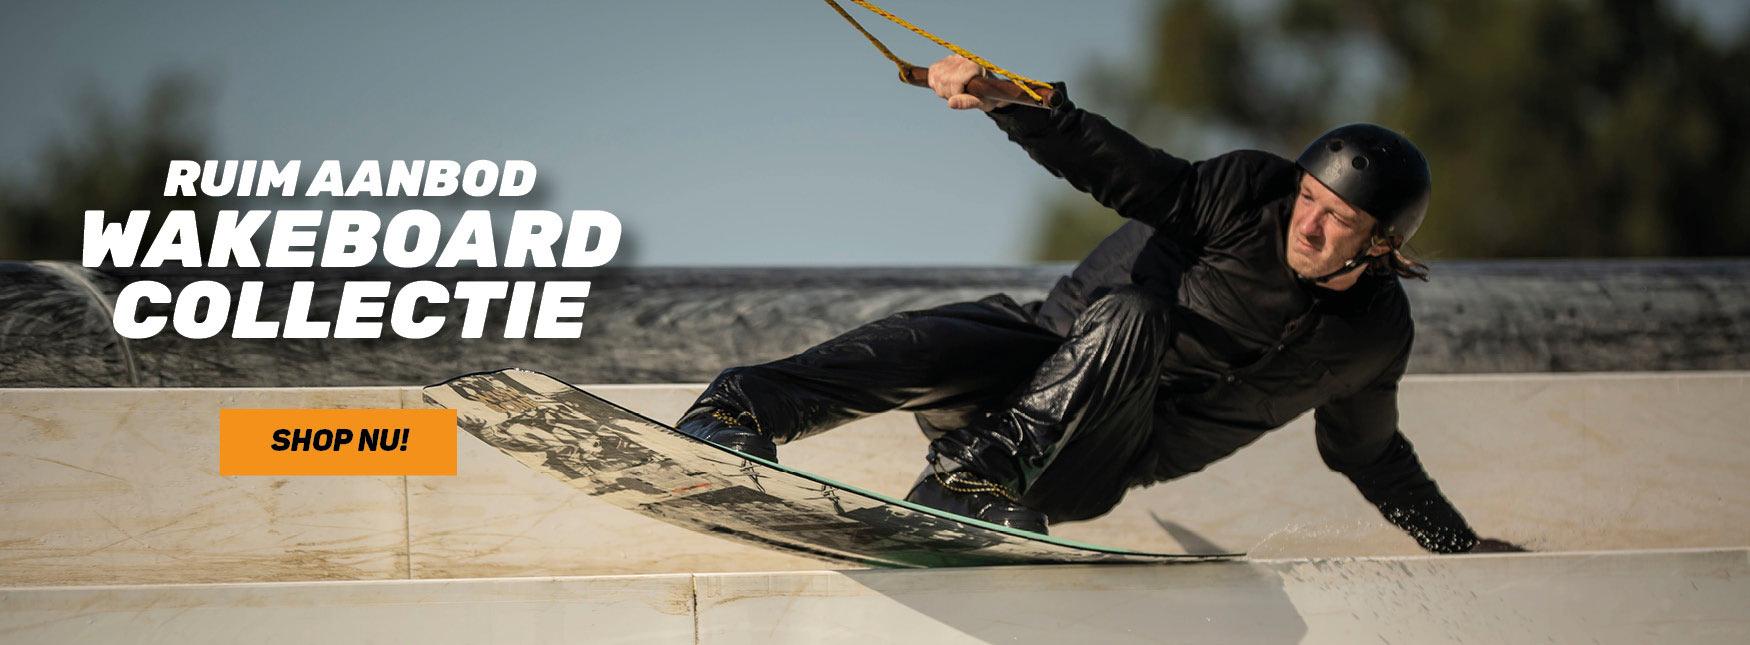 wakeboardshop